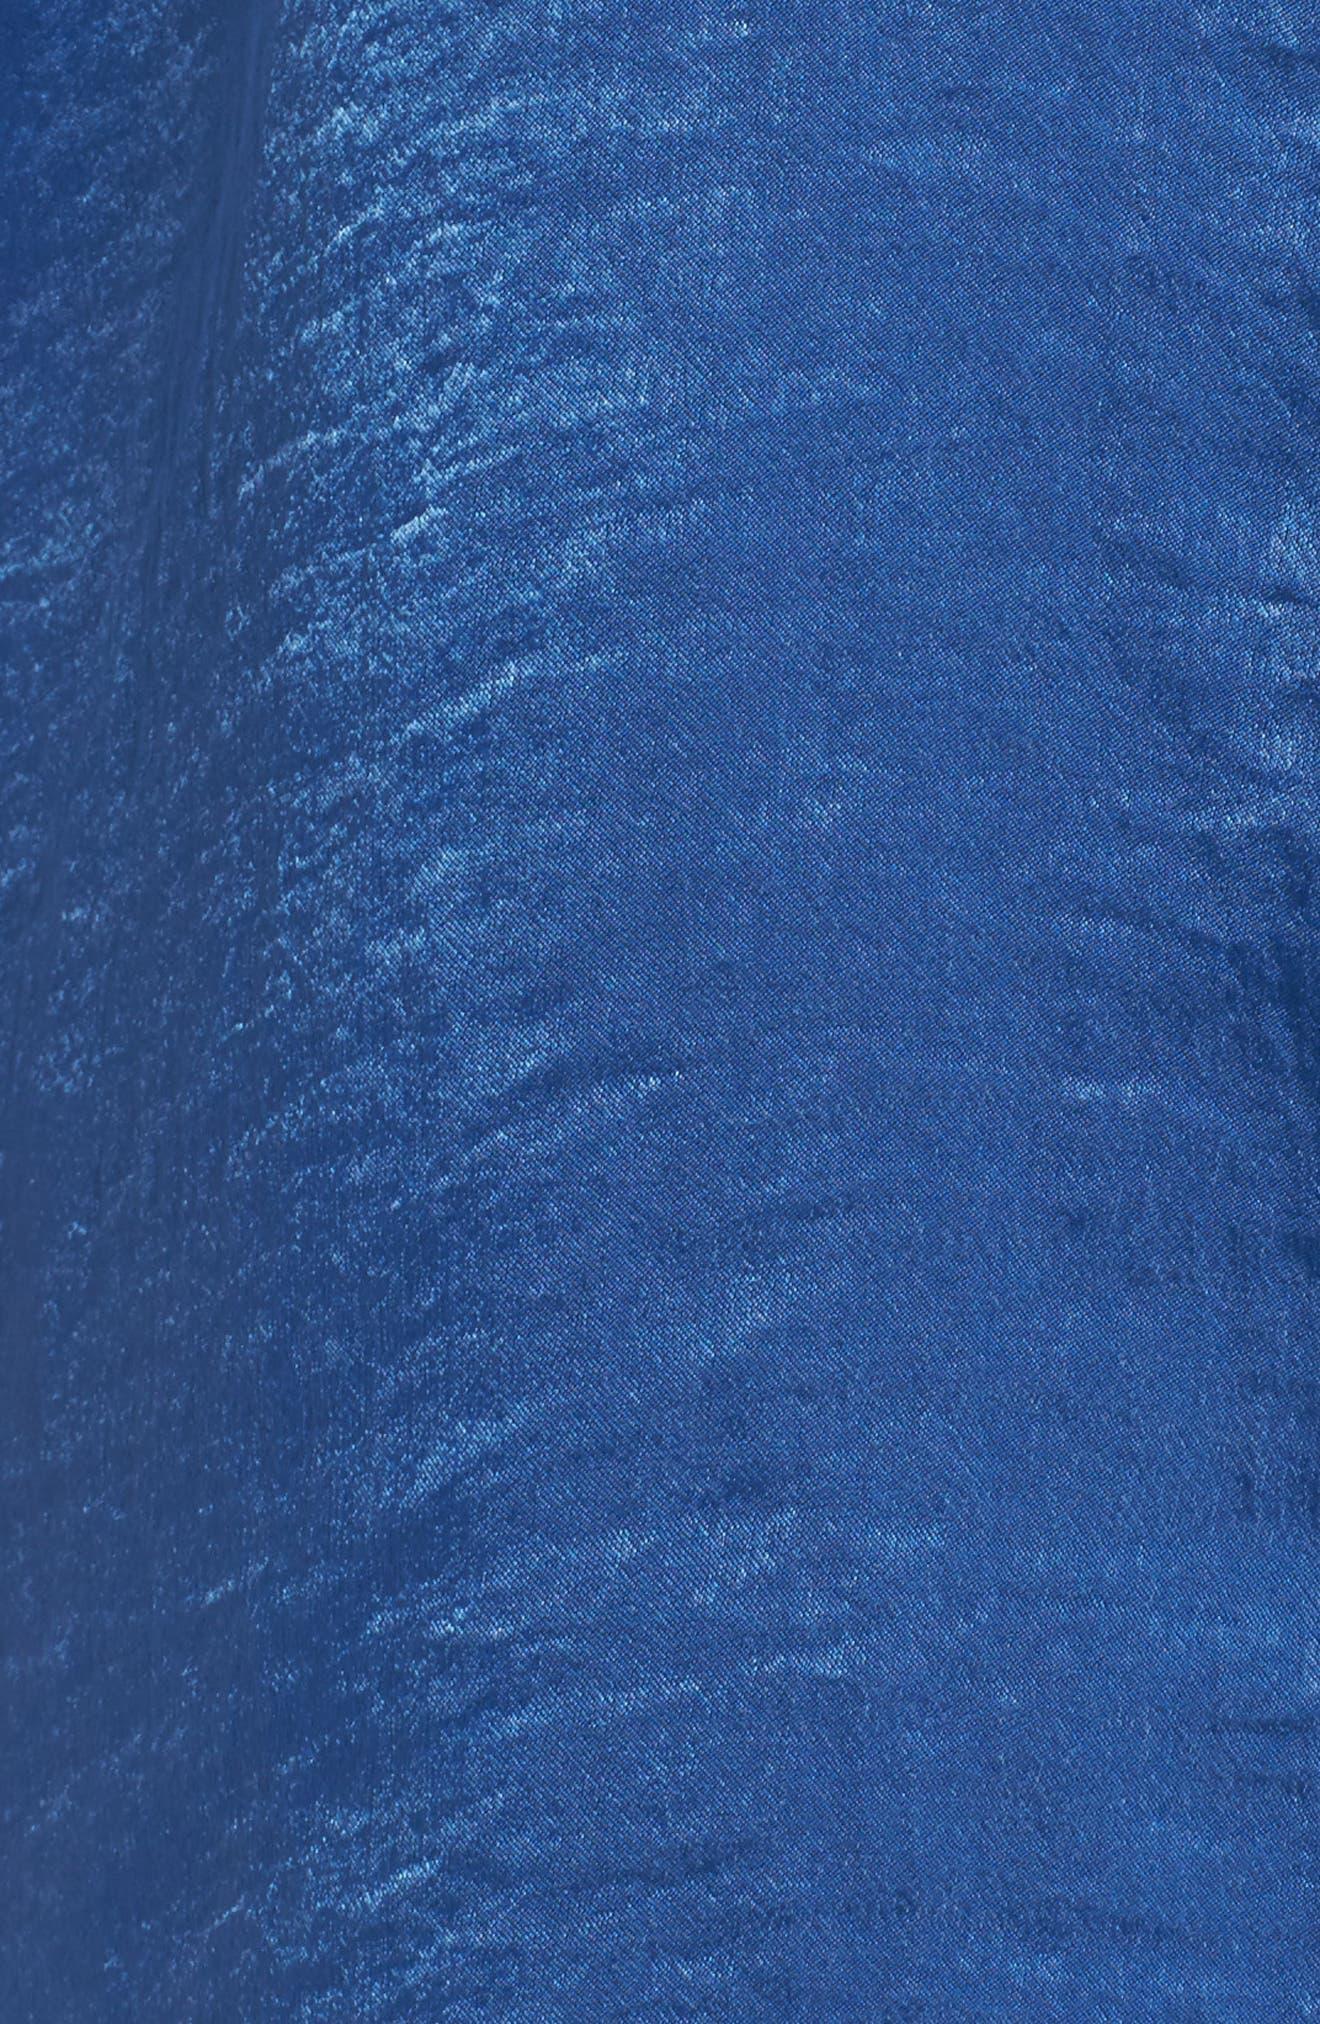 Bell Sleeve Rumpled Satin Blouse,                             Alternate thumbnail 5, color,                             422